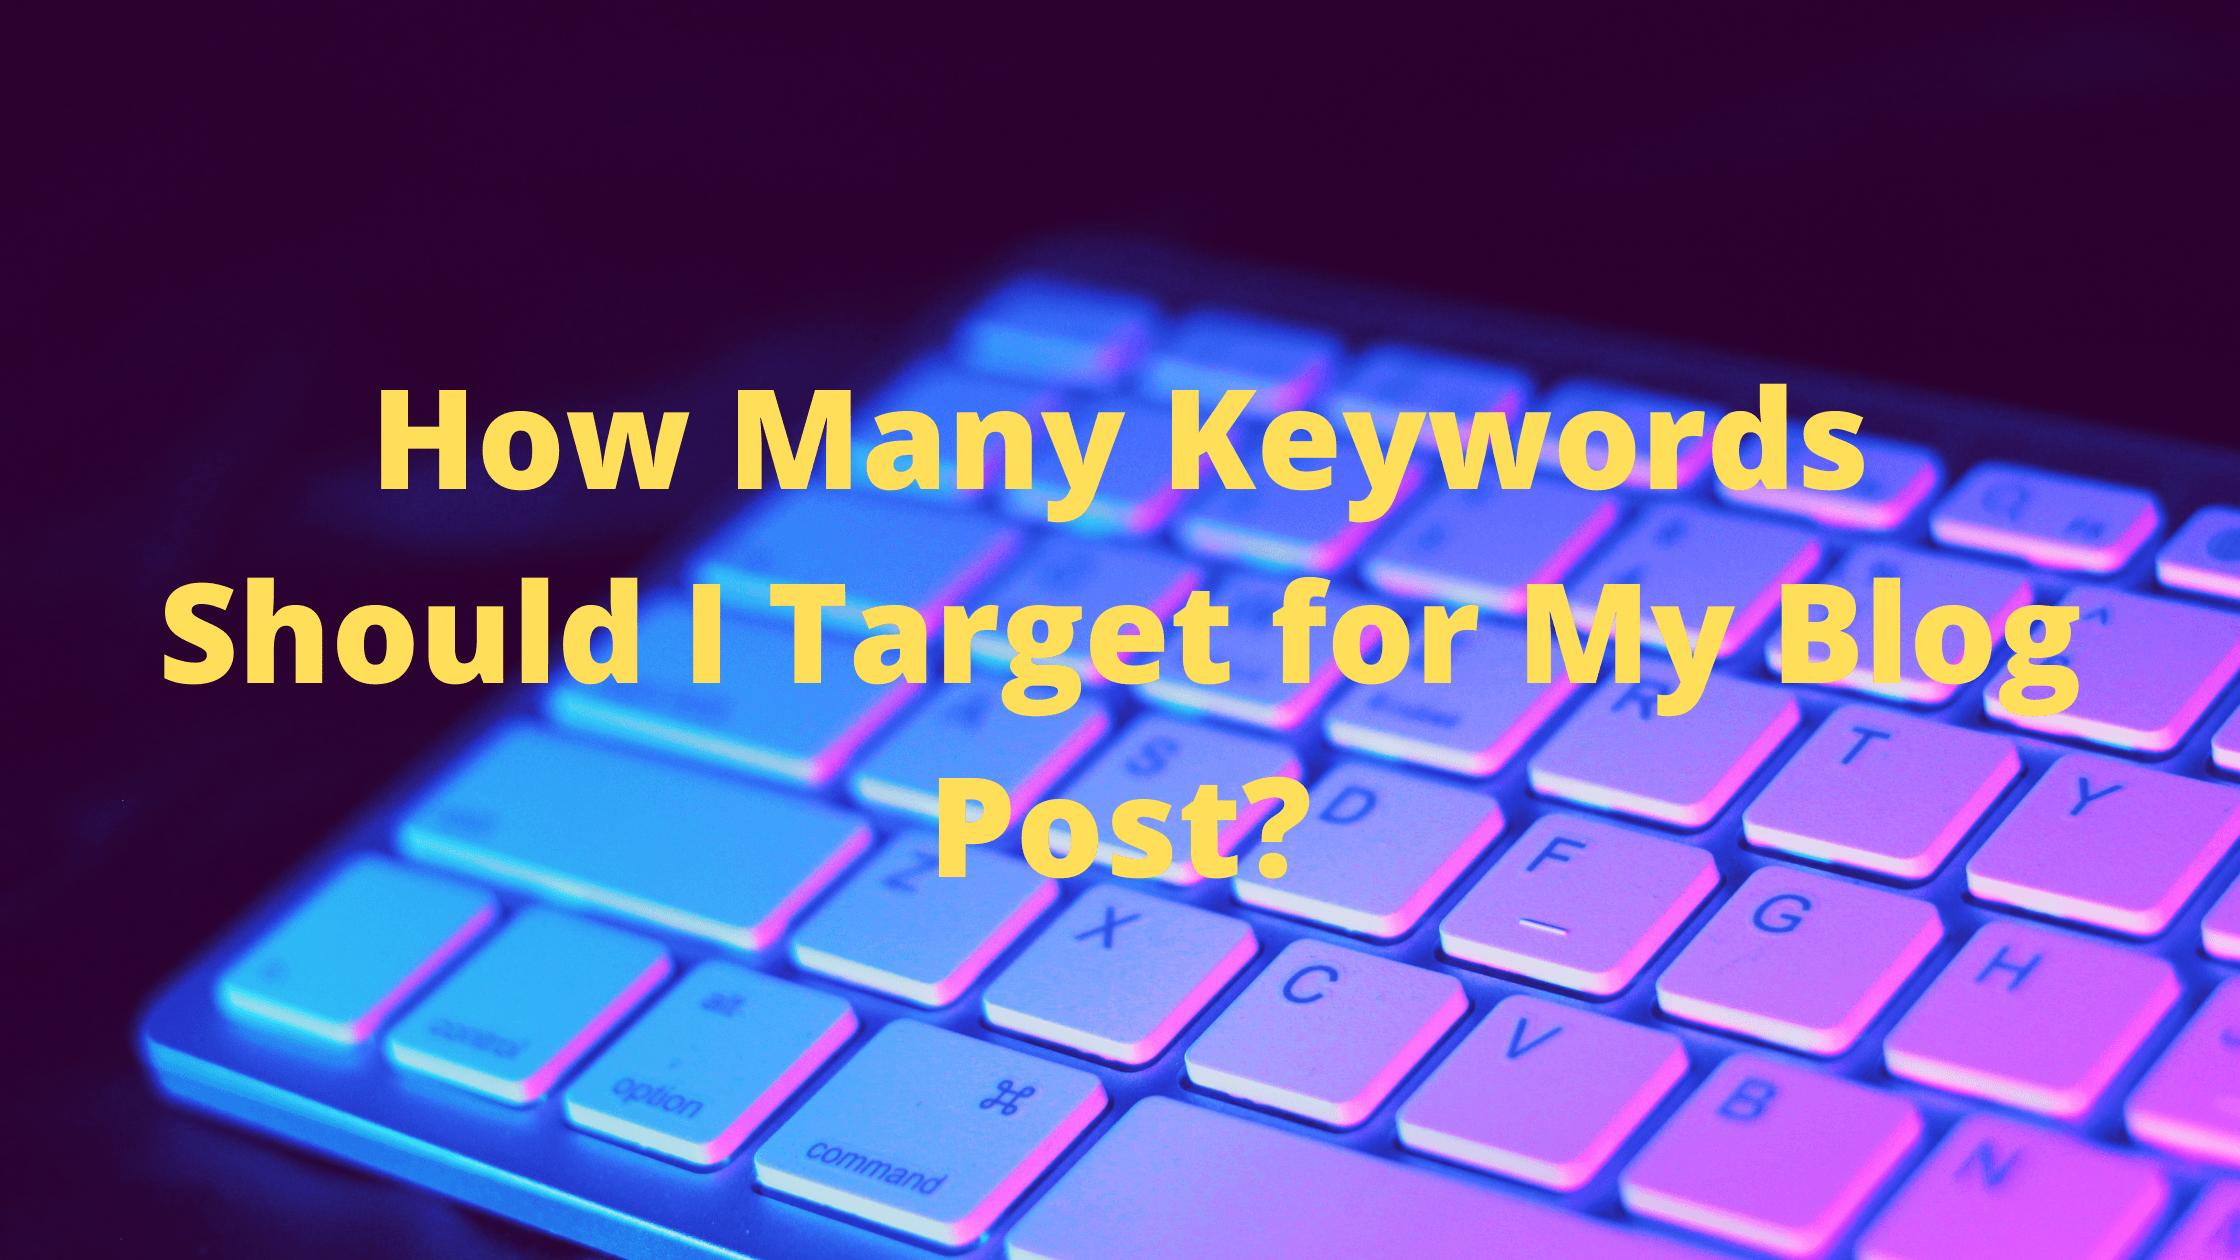 How Many Keywords Should I Target for My Blog Post